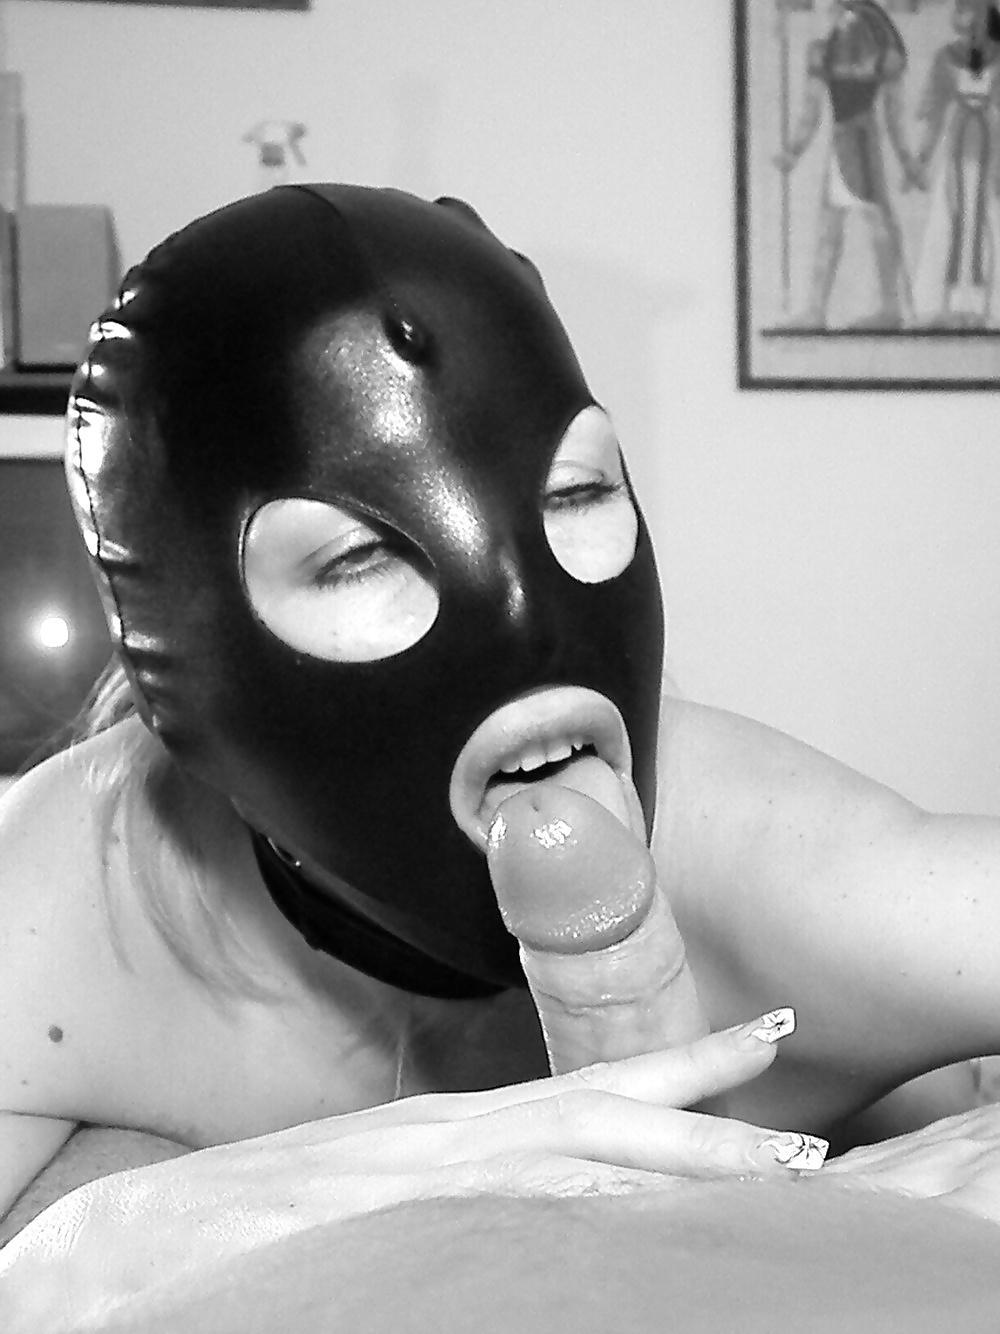 видео трах в маске в рот латекс - 5